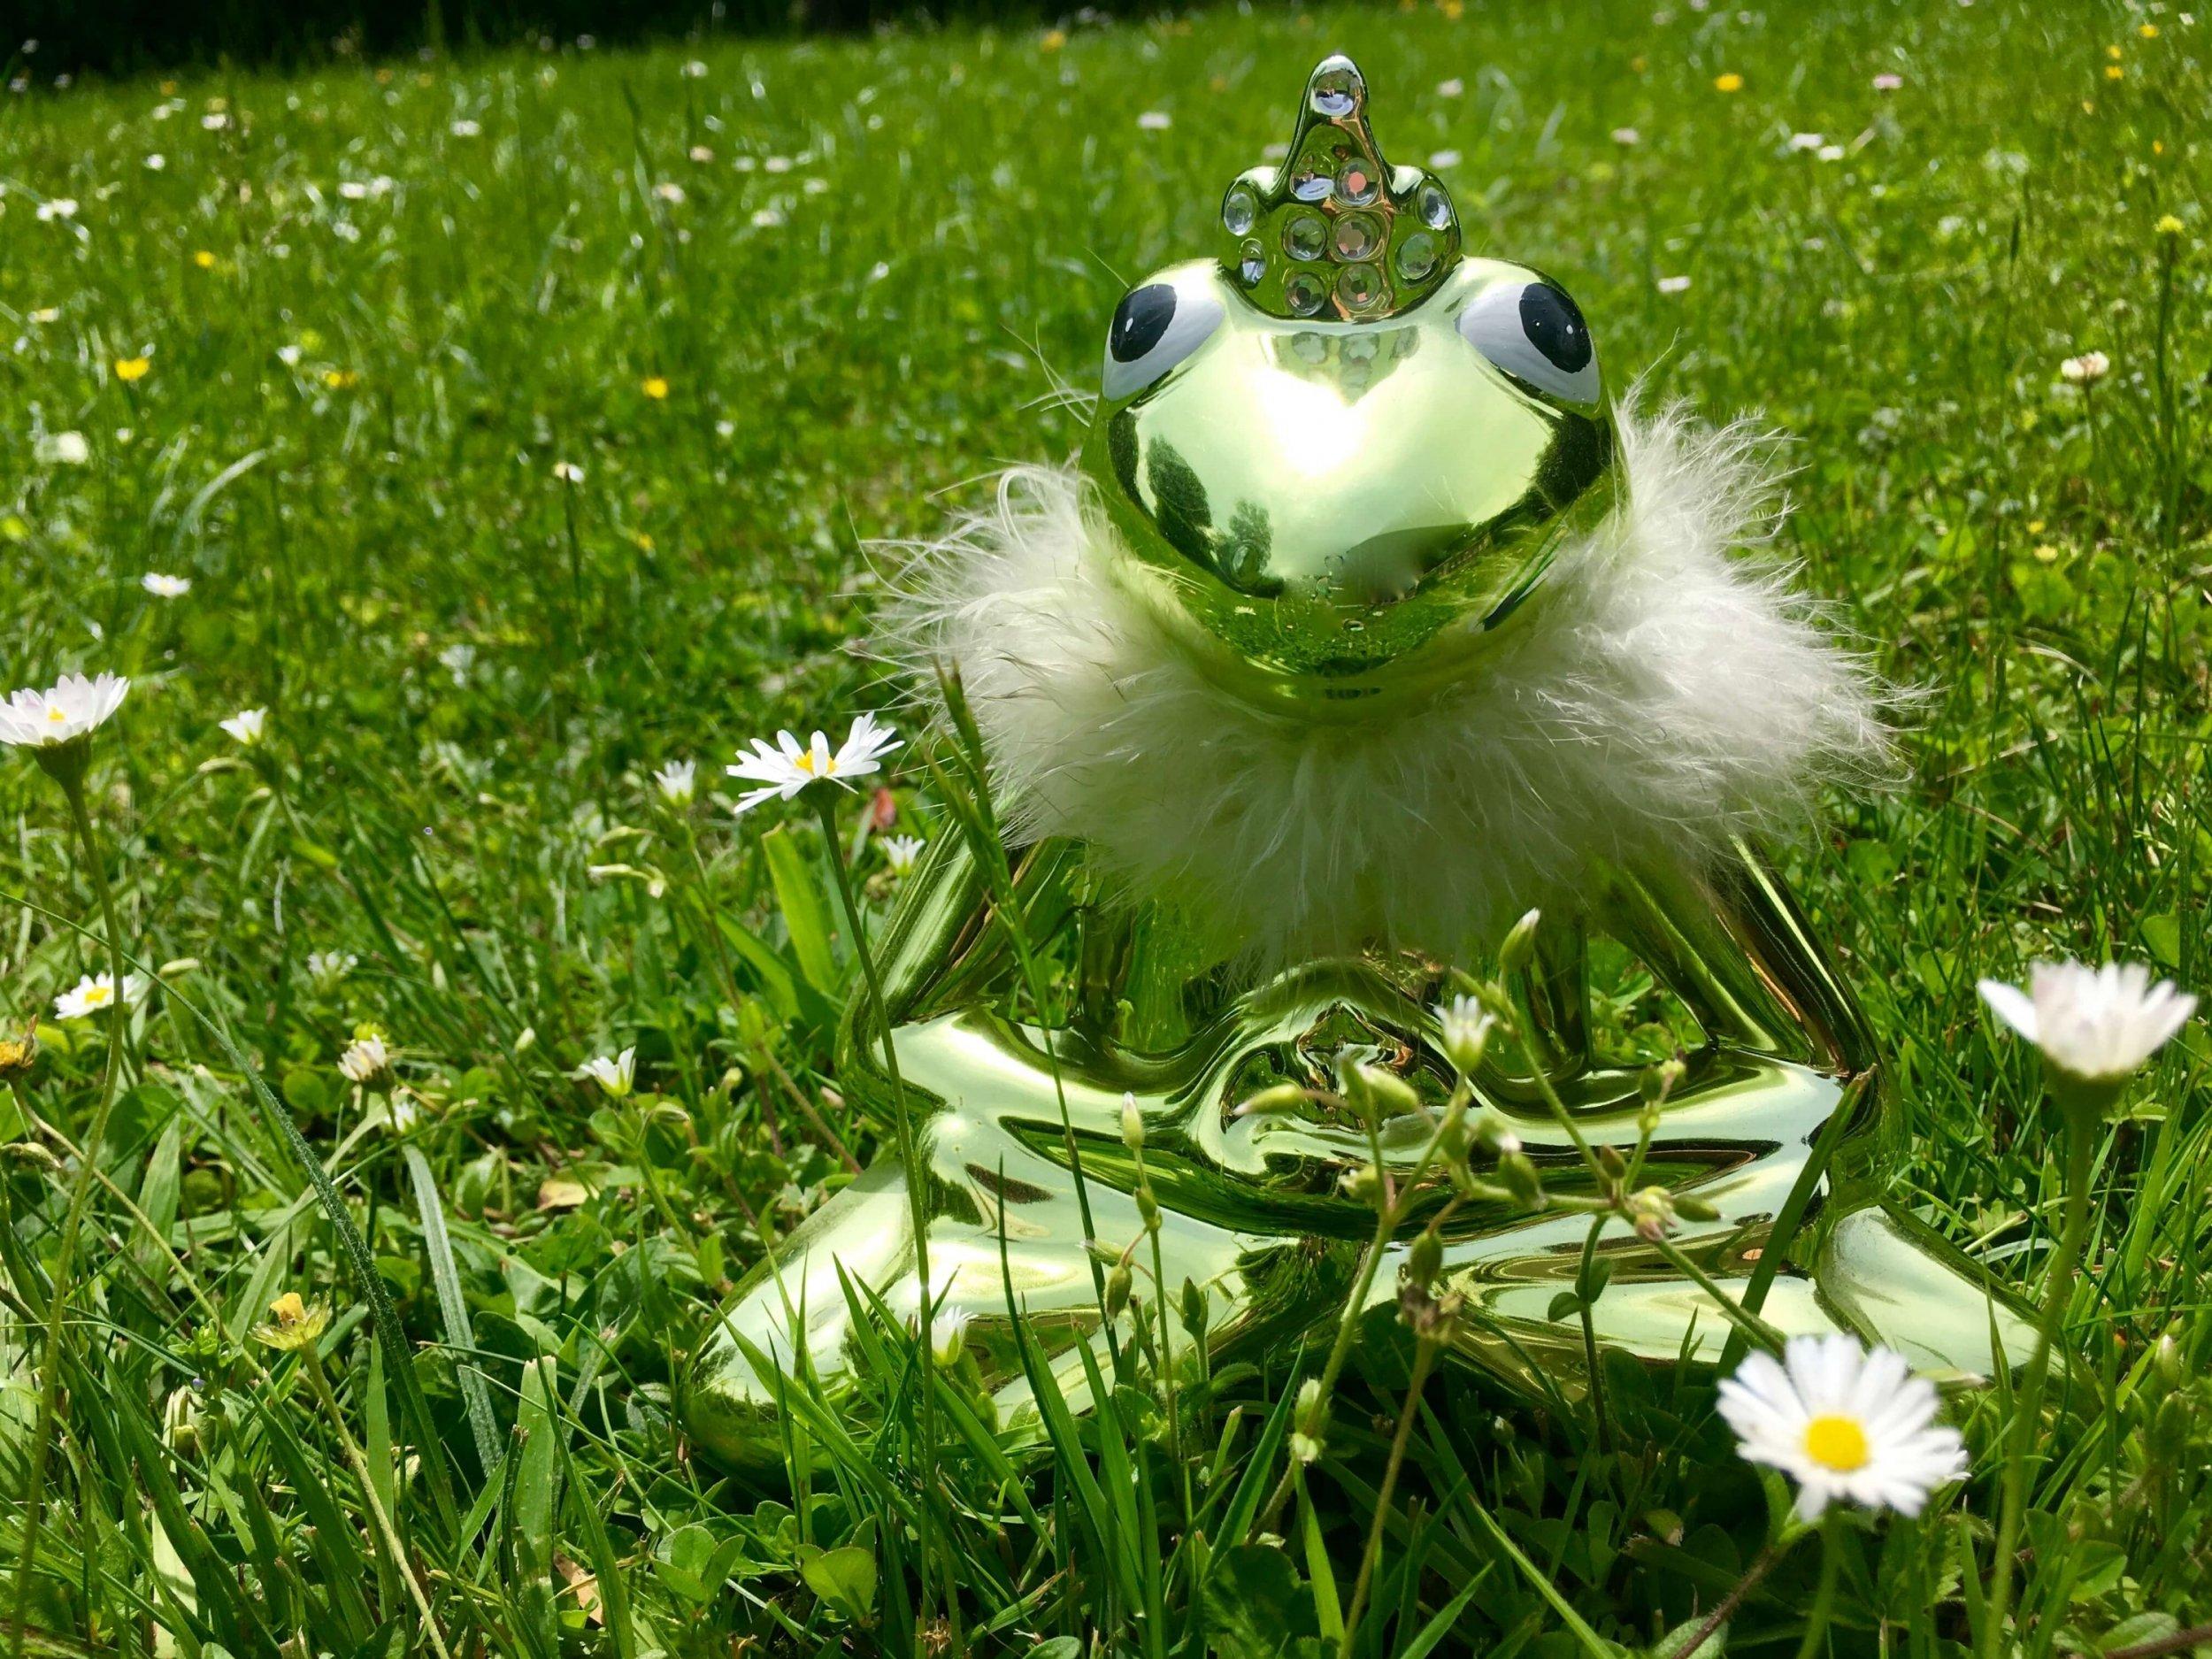 Porzellanfrosch im Gras